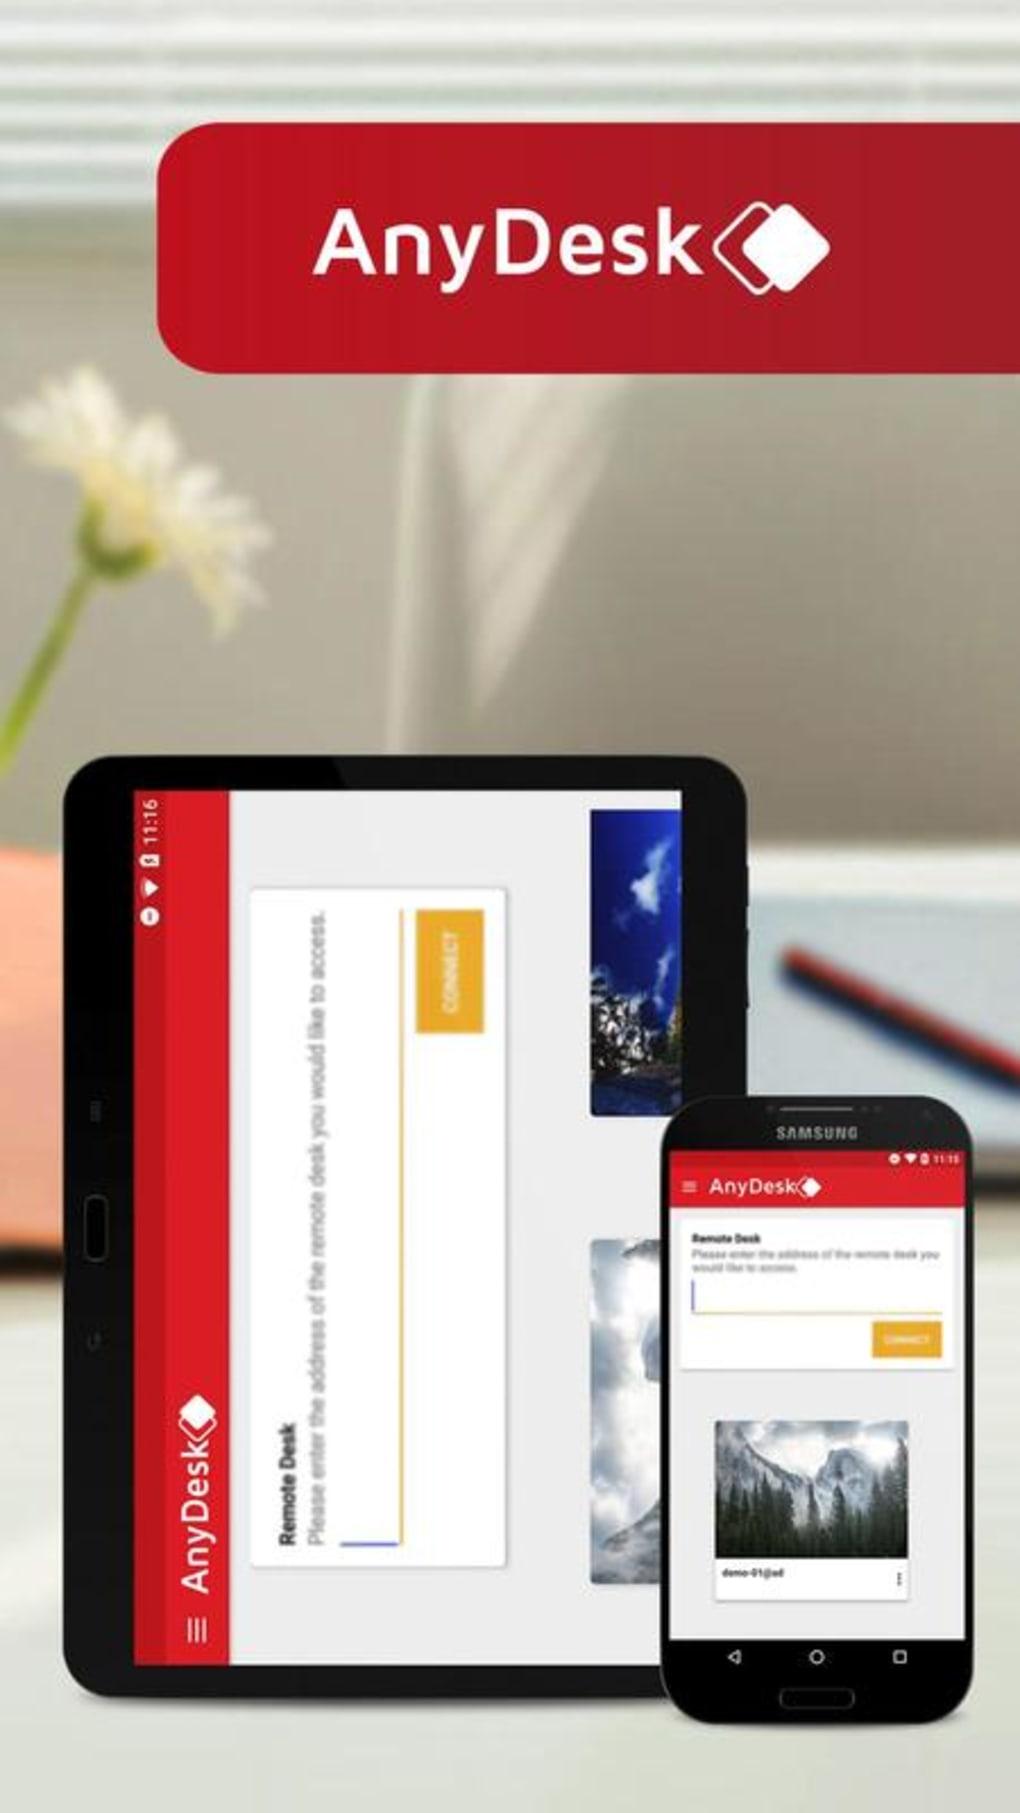 AnyDesk Remote Desktop for Android - Download